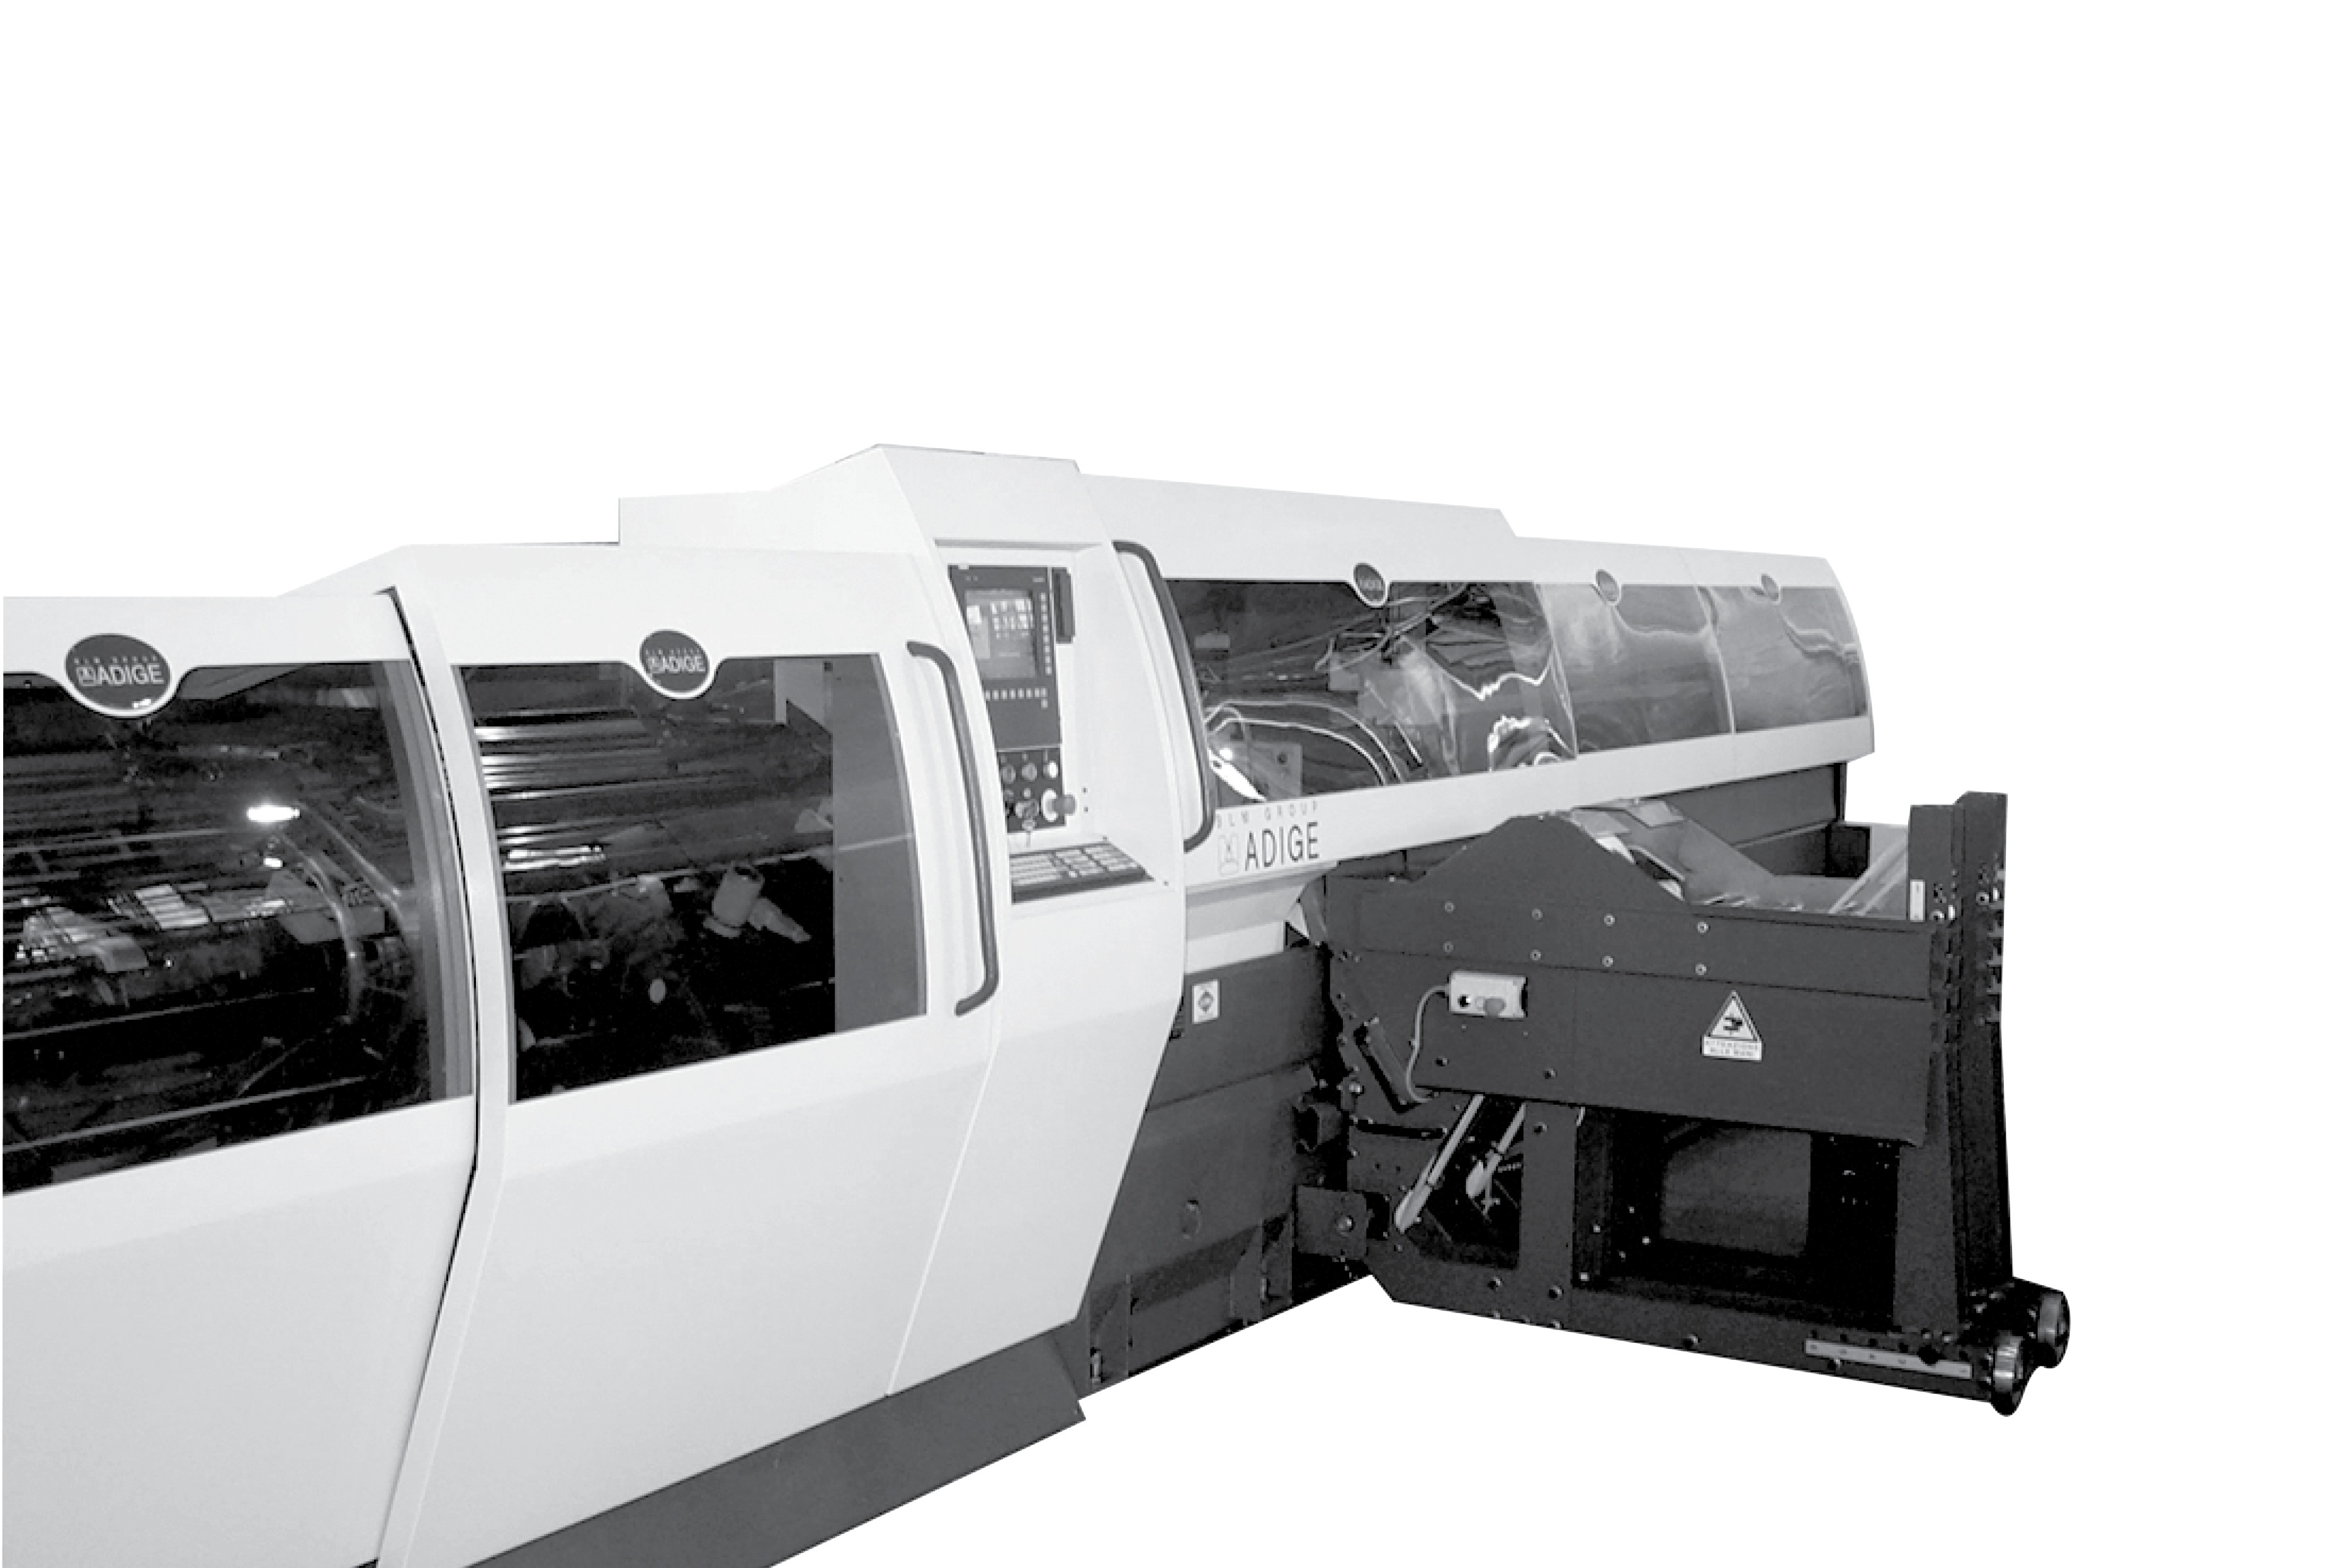 Design carrozzeria macchina segatrice tubi BLM Group